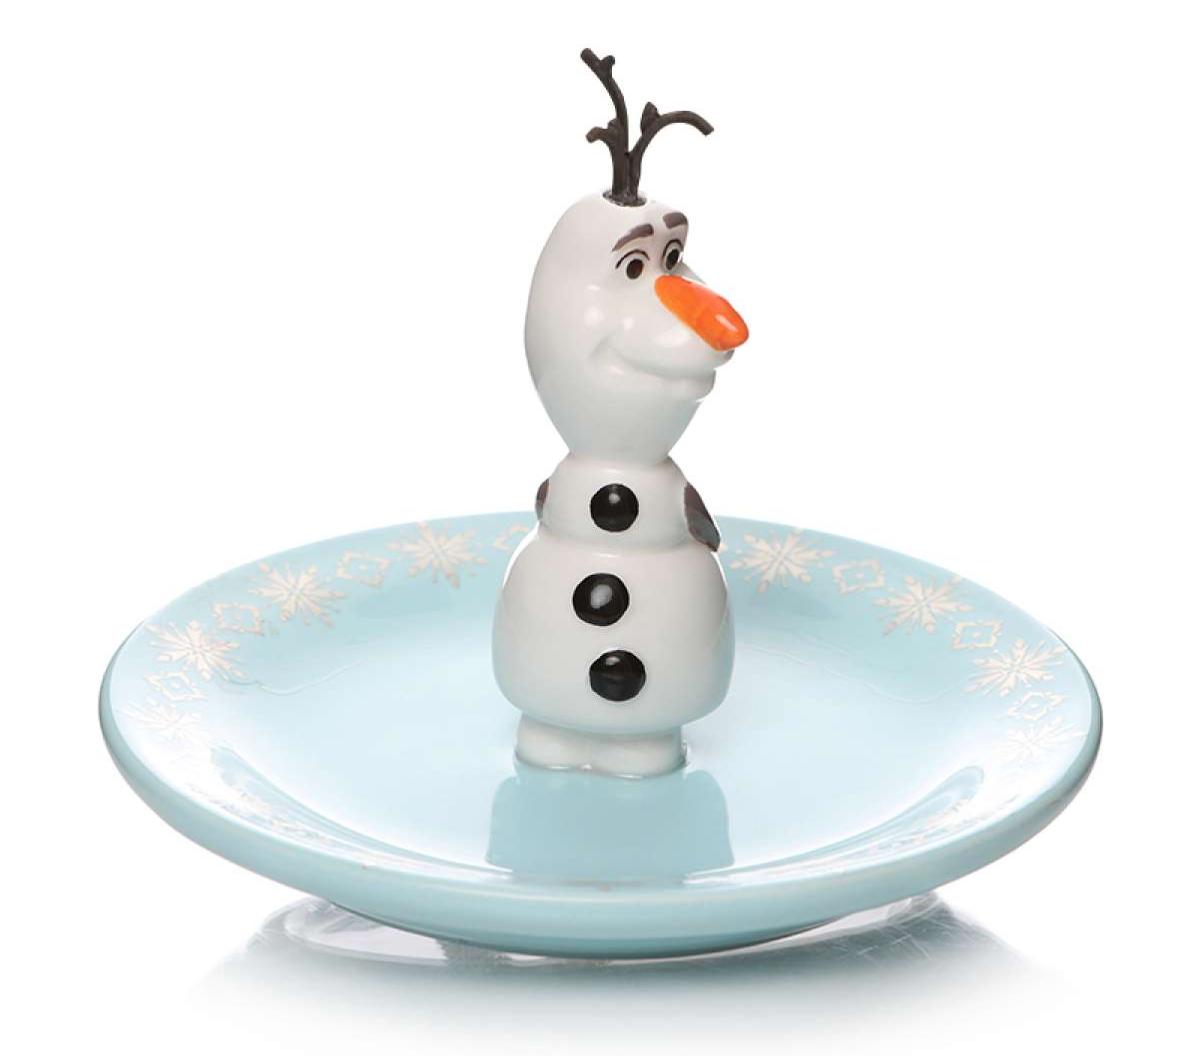 olaf smykkeholder - 10+ Olaf gaveideer til børn